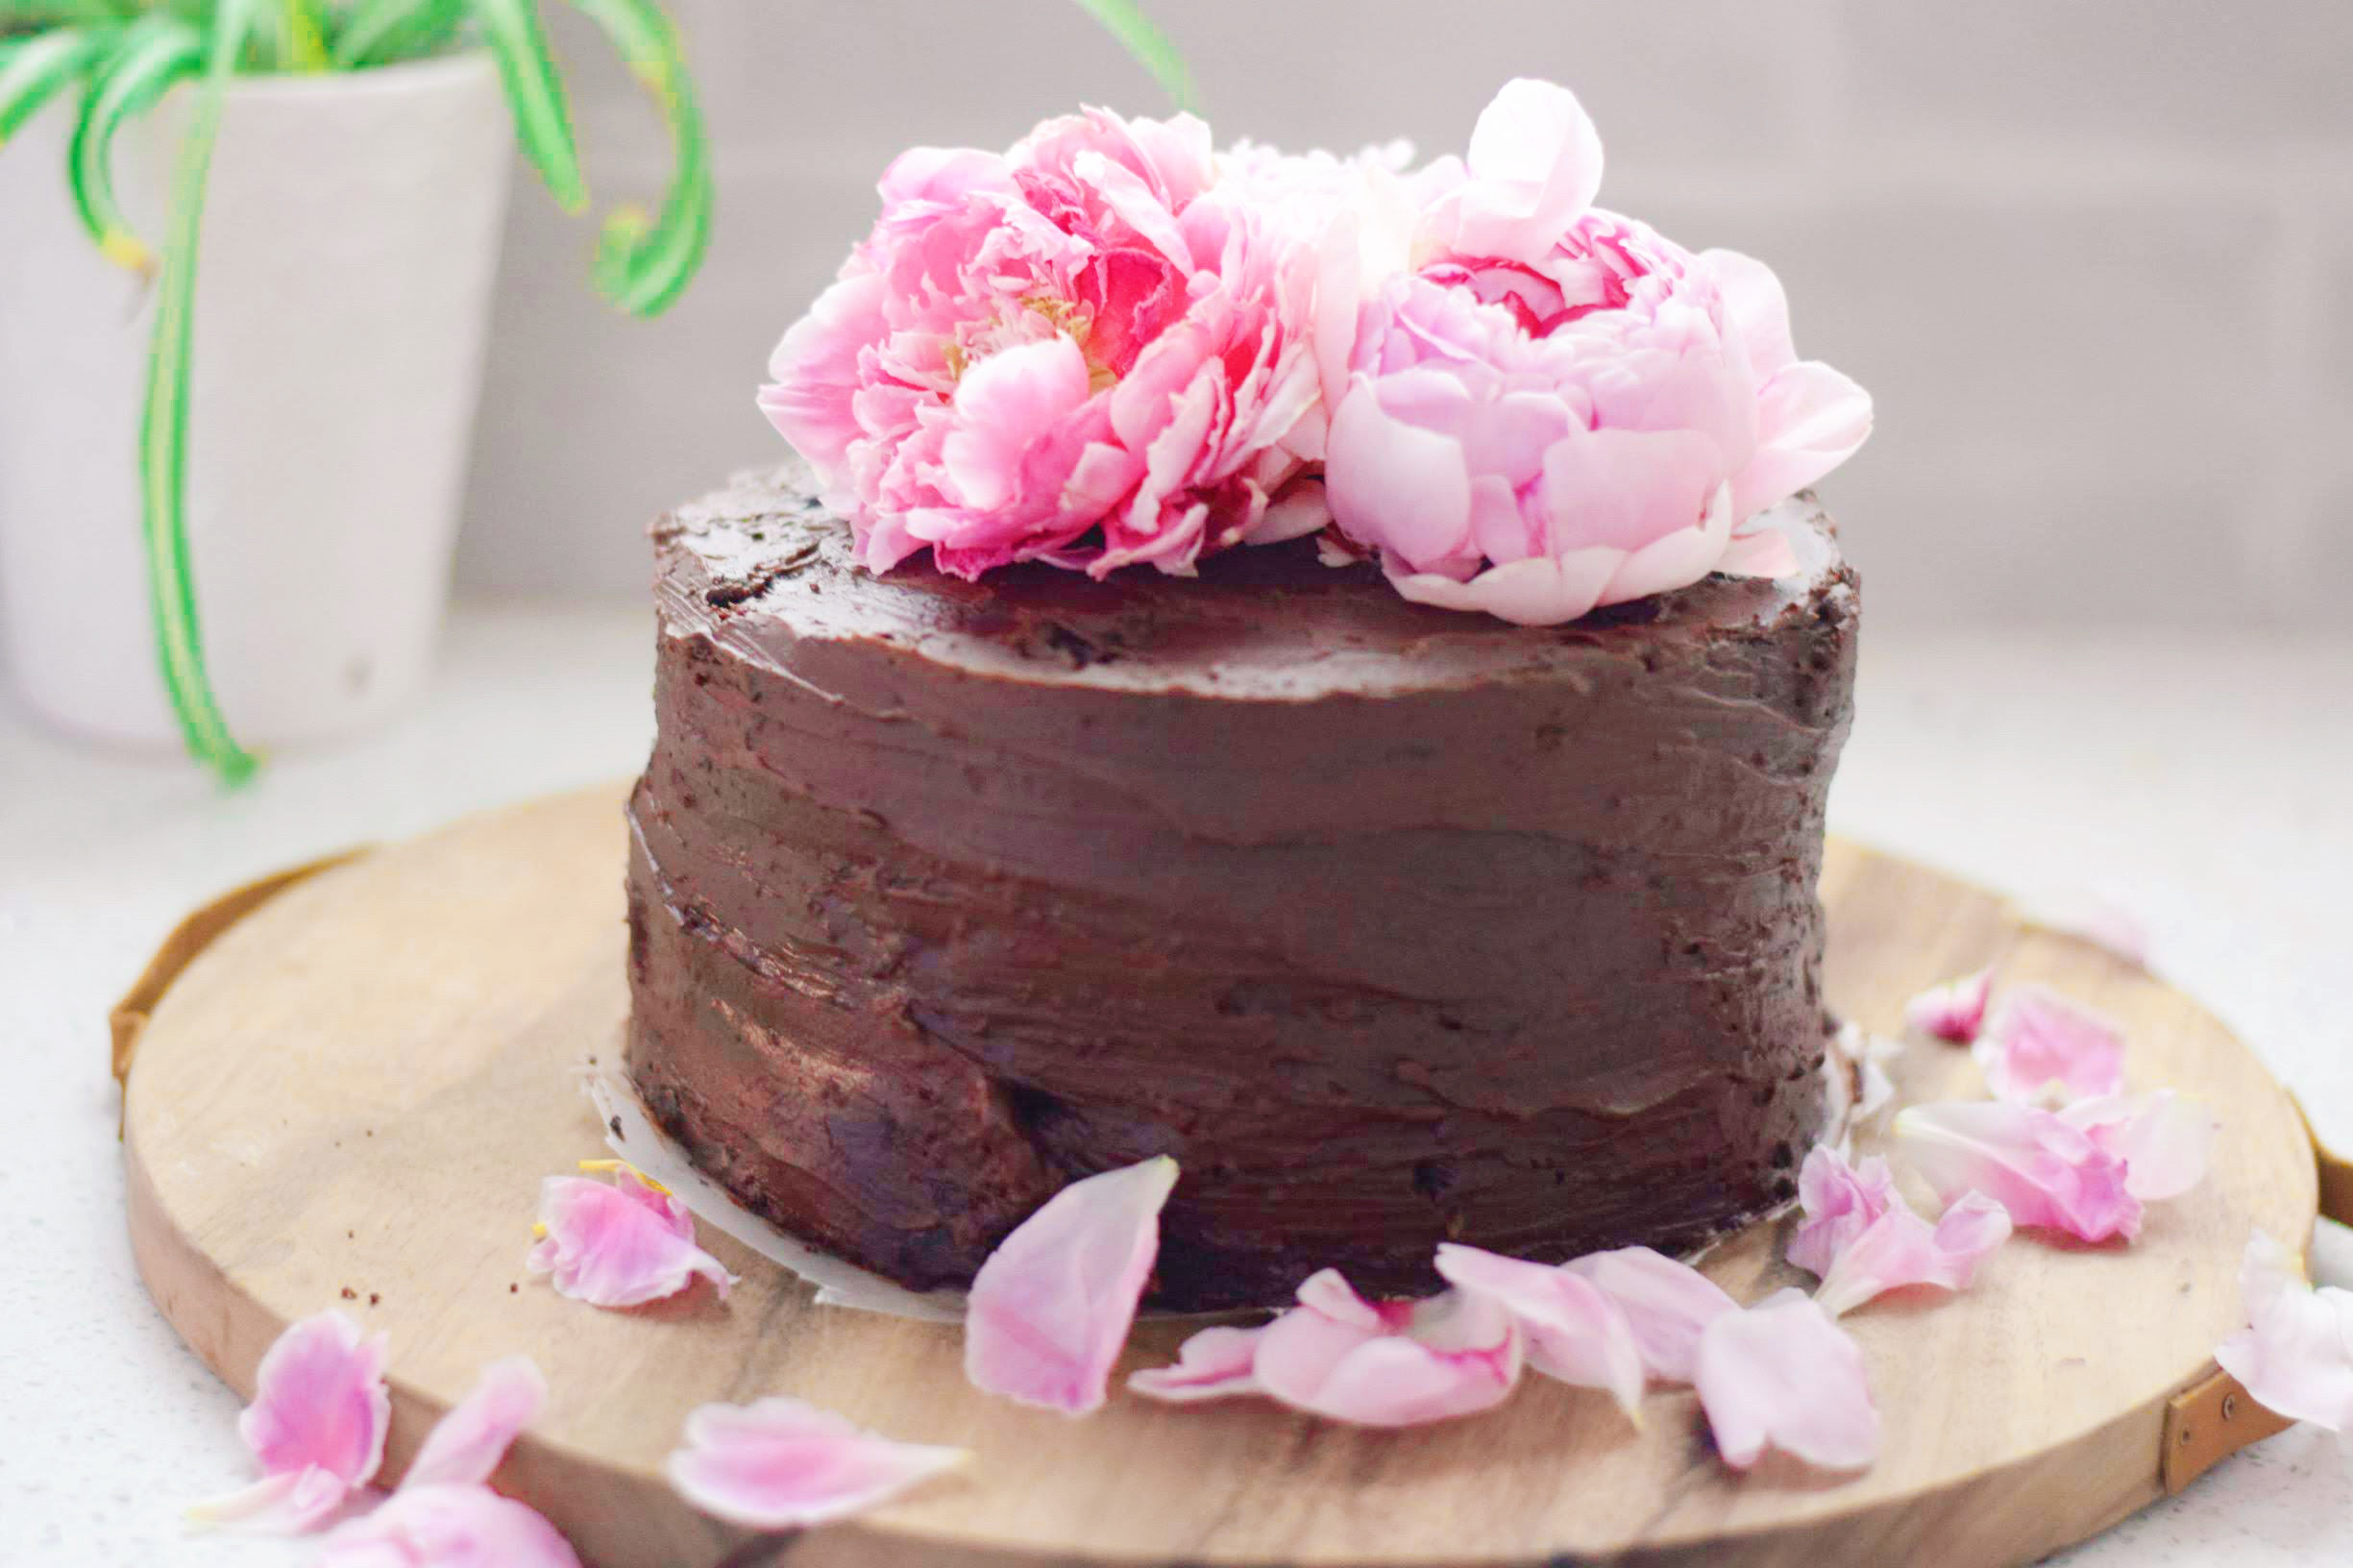 Guinness stout chocolate cake